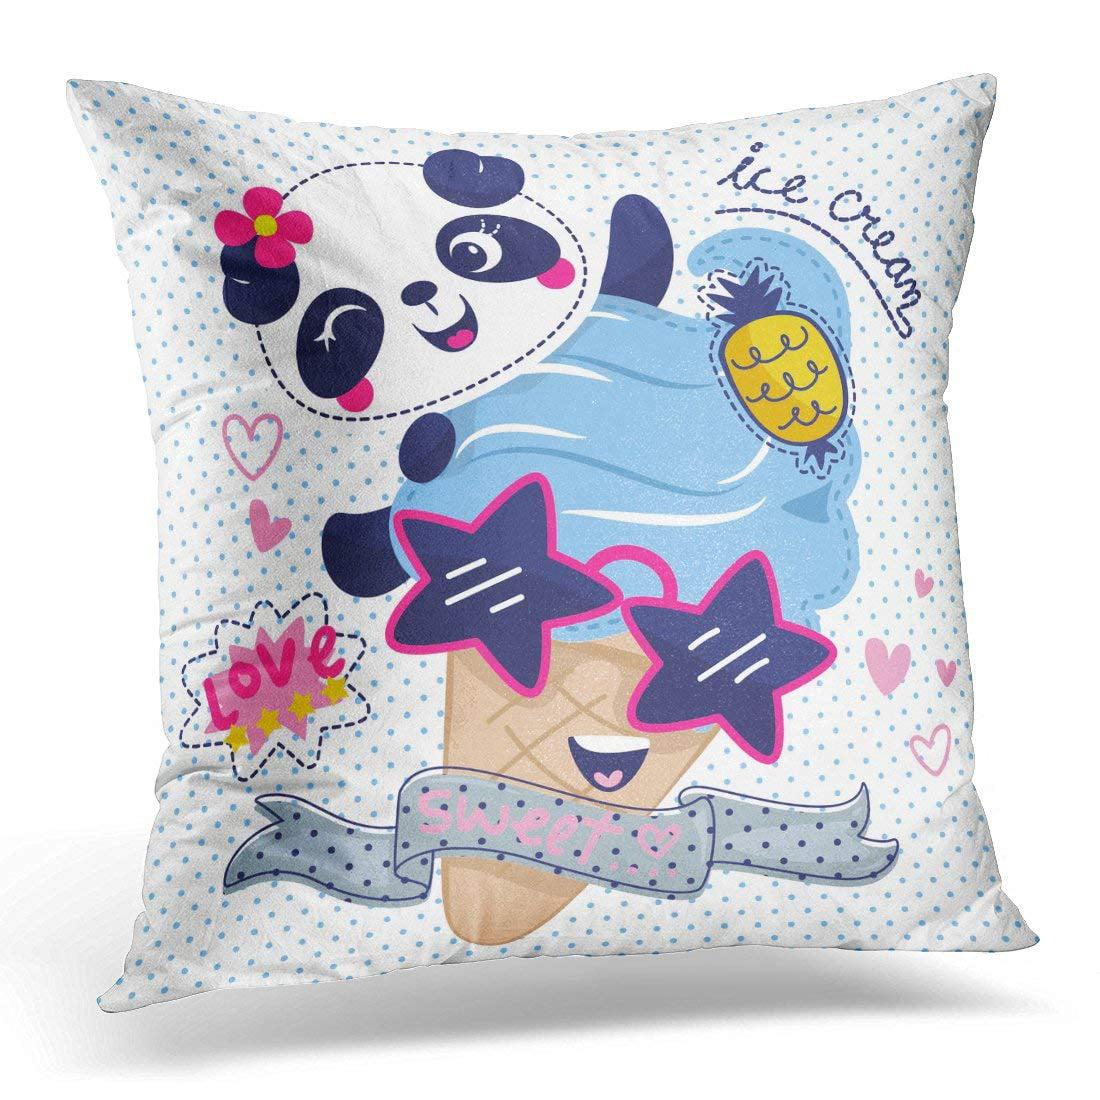 CMFUN Adorable Cartoon Cute Panda Girl with Ice Cream Wearing Sunglasses on Polka Dot Animal Throw Pillow Case Pillow Cover Sofa Home Decor 16x16 Inches